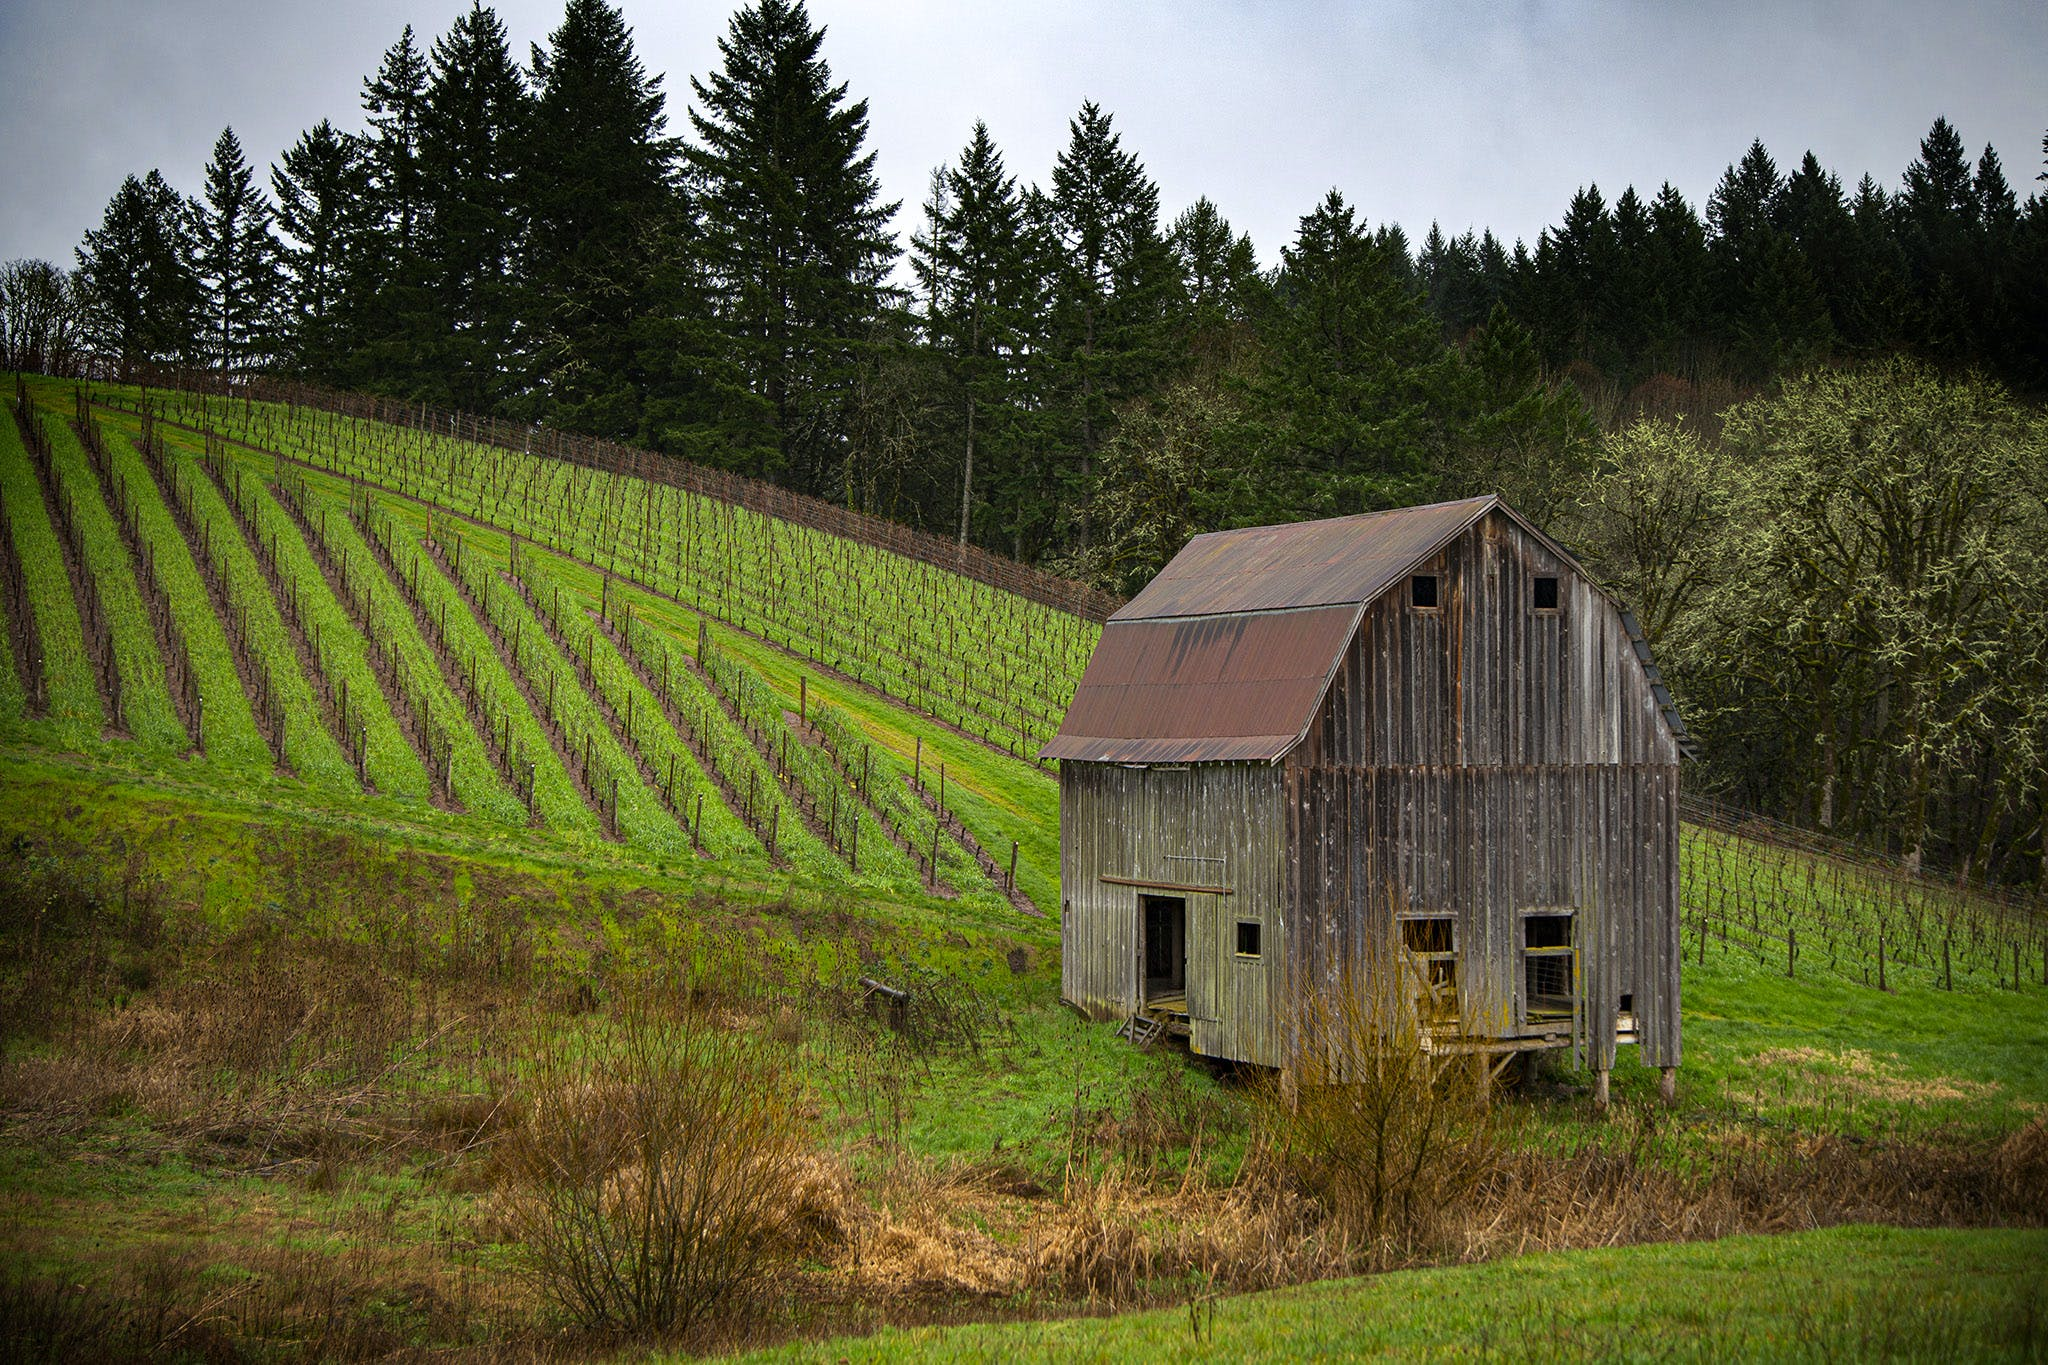 Barn, Farm, Oregon Wine Country, Colene Clemens, Newberg, Getaway